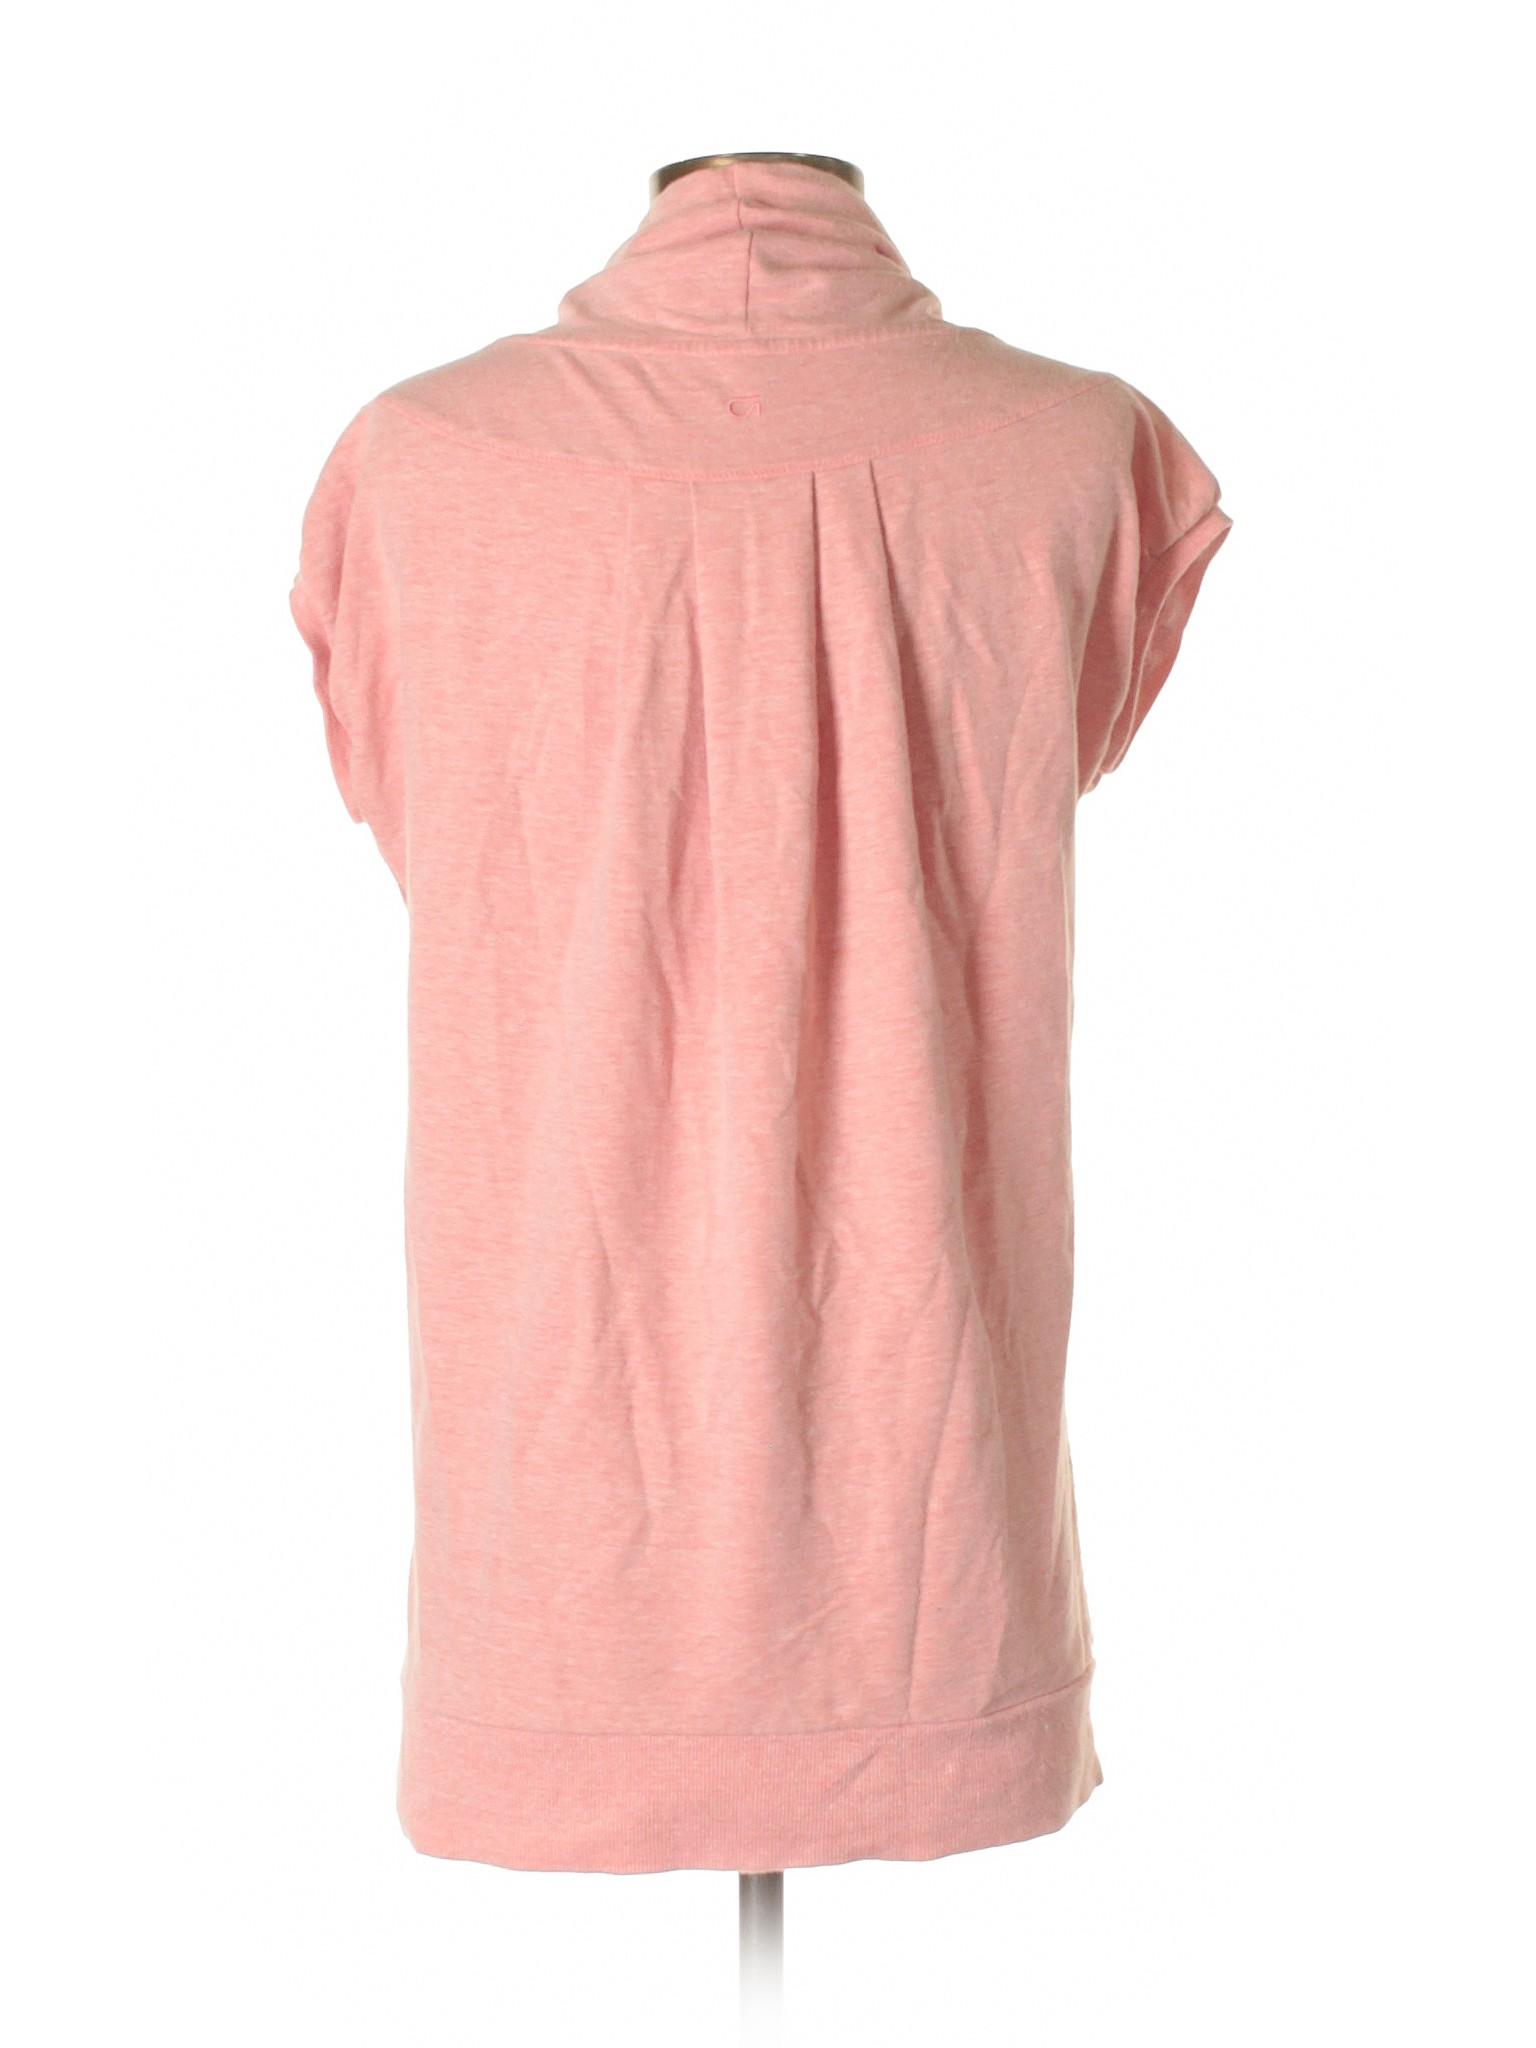 Pullover Boutique Sweater Gap winter Body YBt68qR